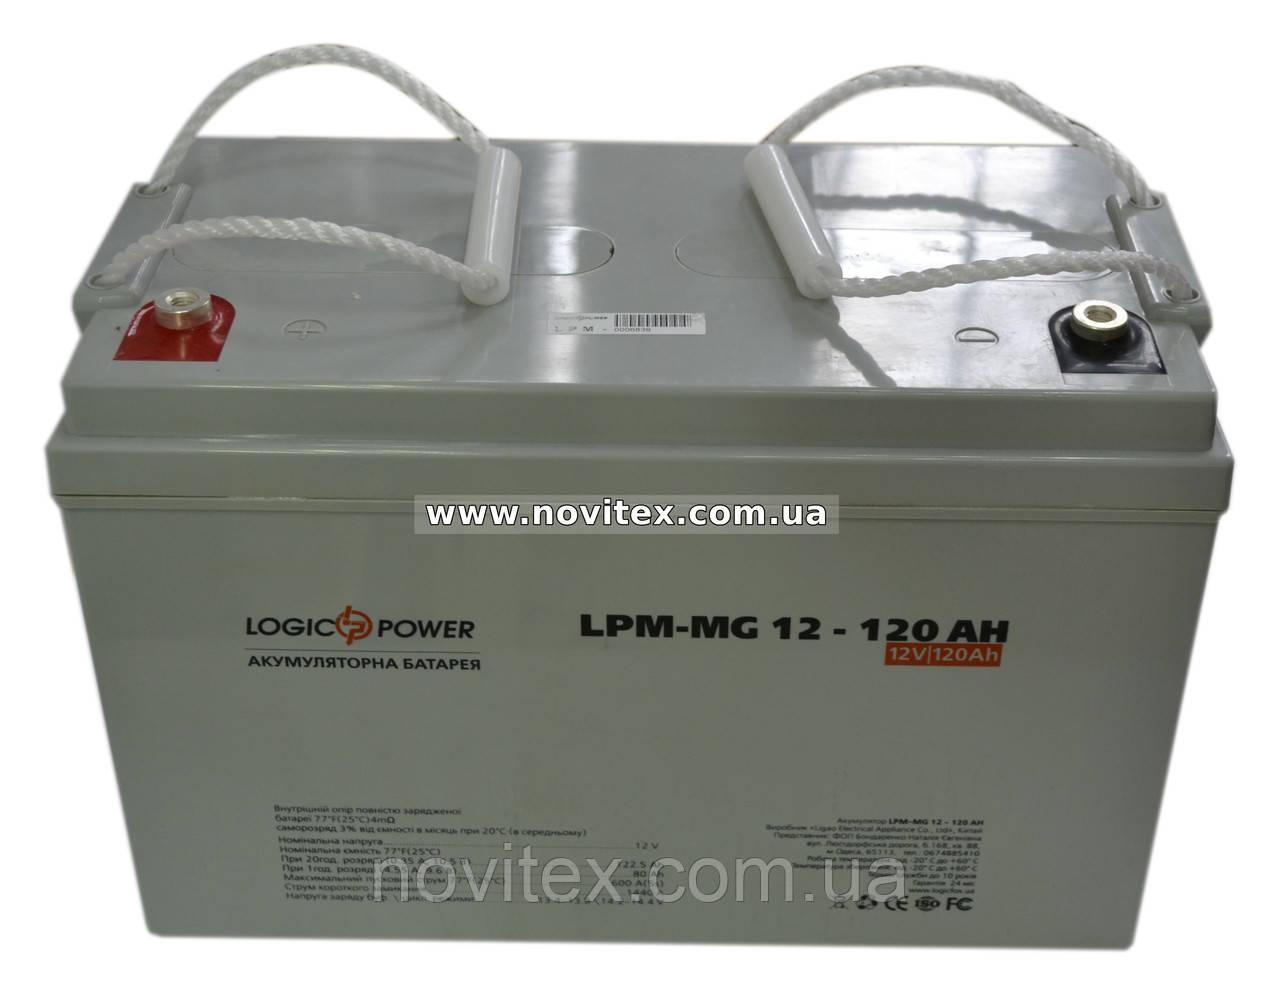 Аккумулятор мультигелевый Logicpower LPM-MG 12V 120AH